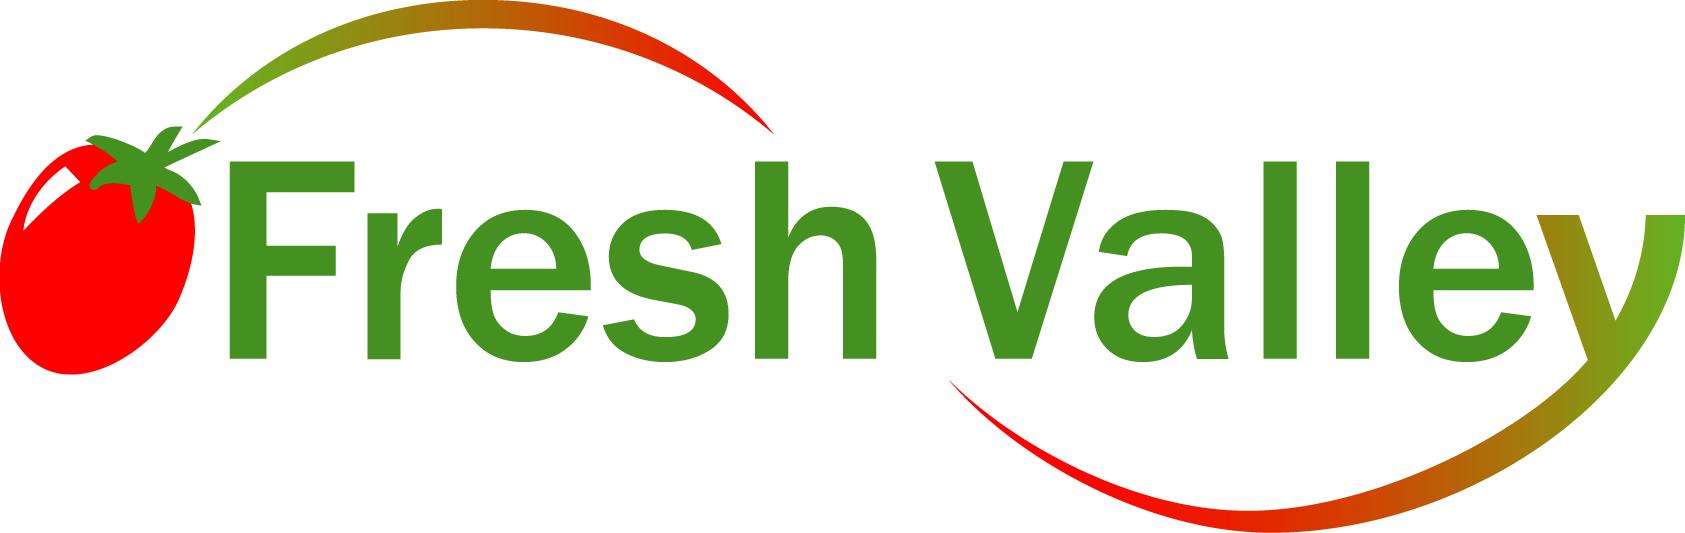 Fresh Valley